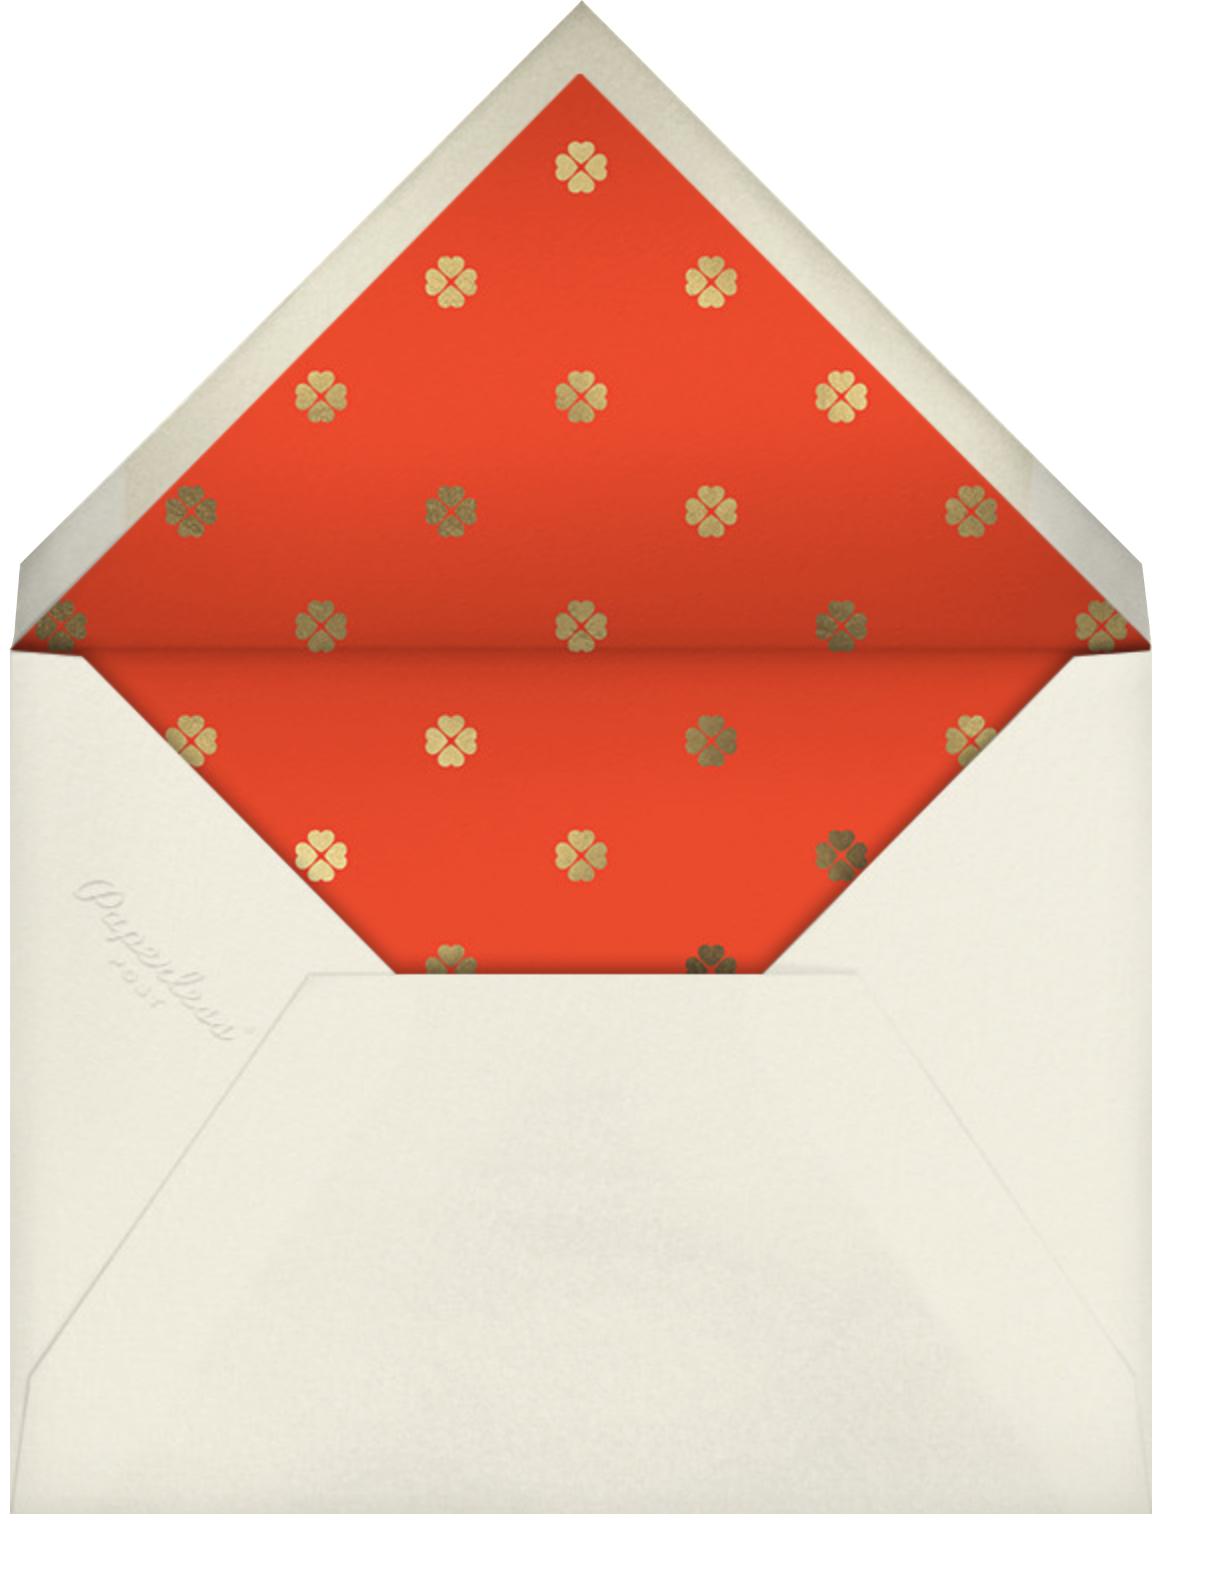 Mod Stripes - kate spade new york - Holiday party - envelope back